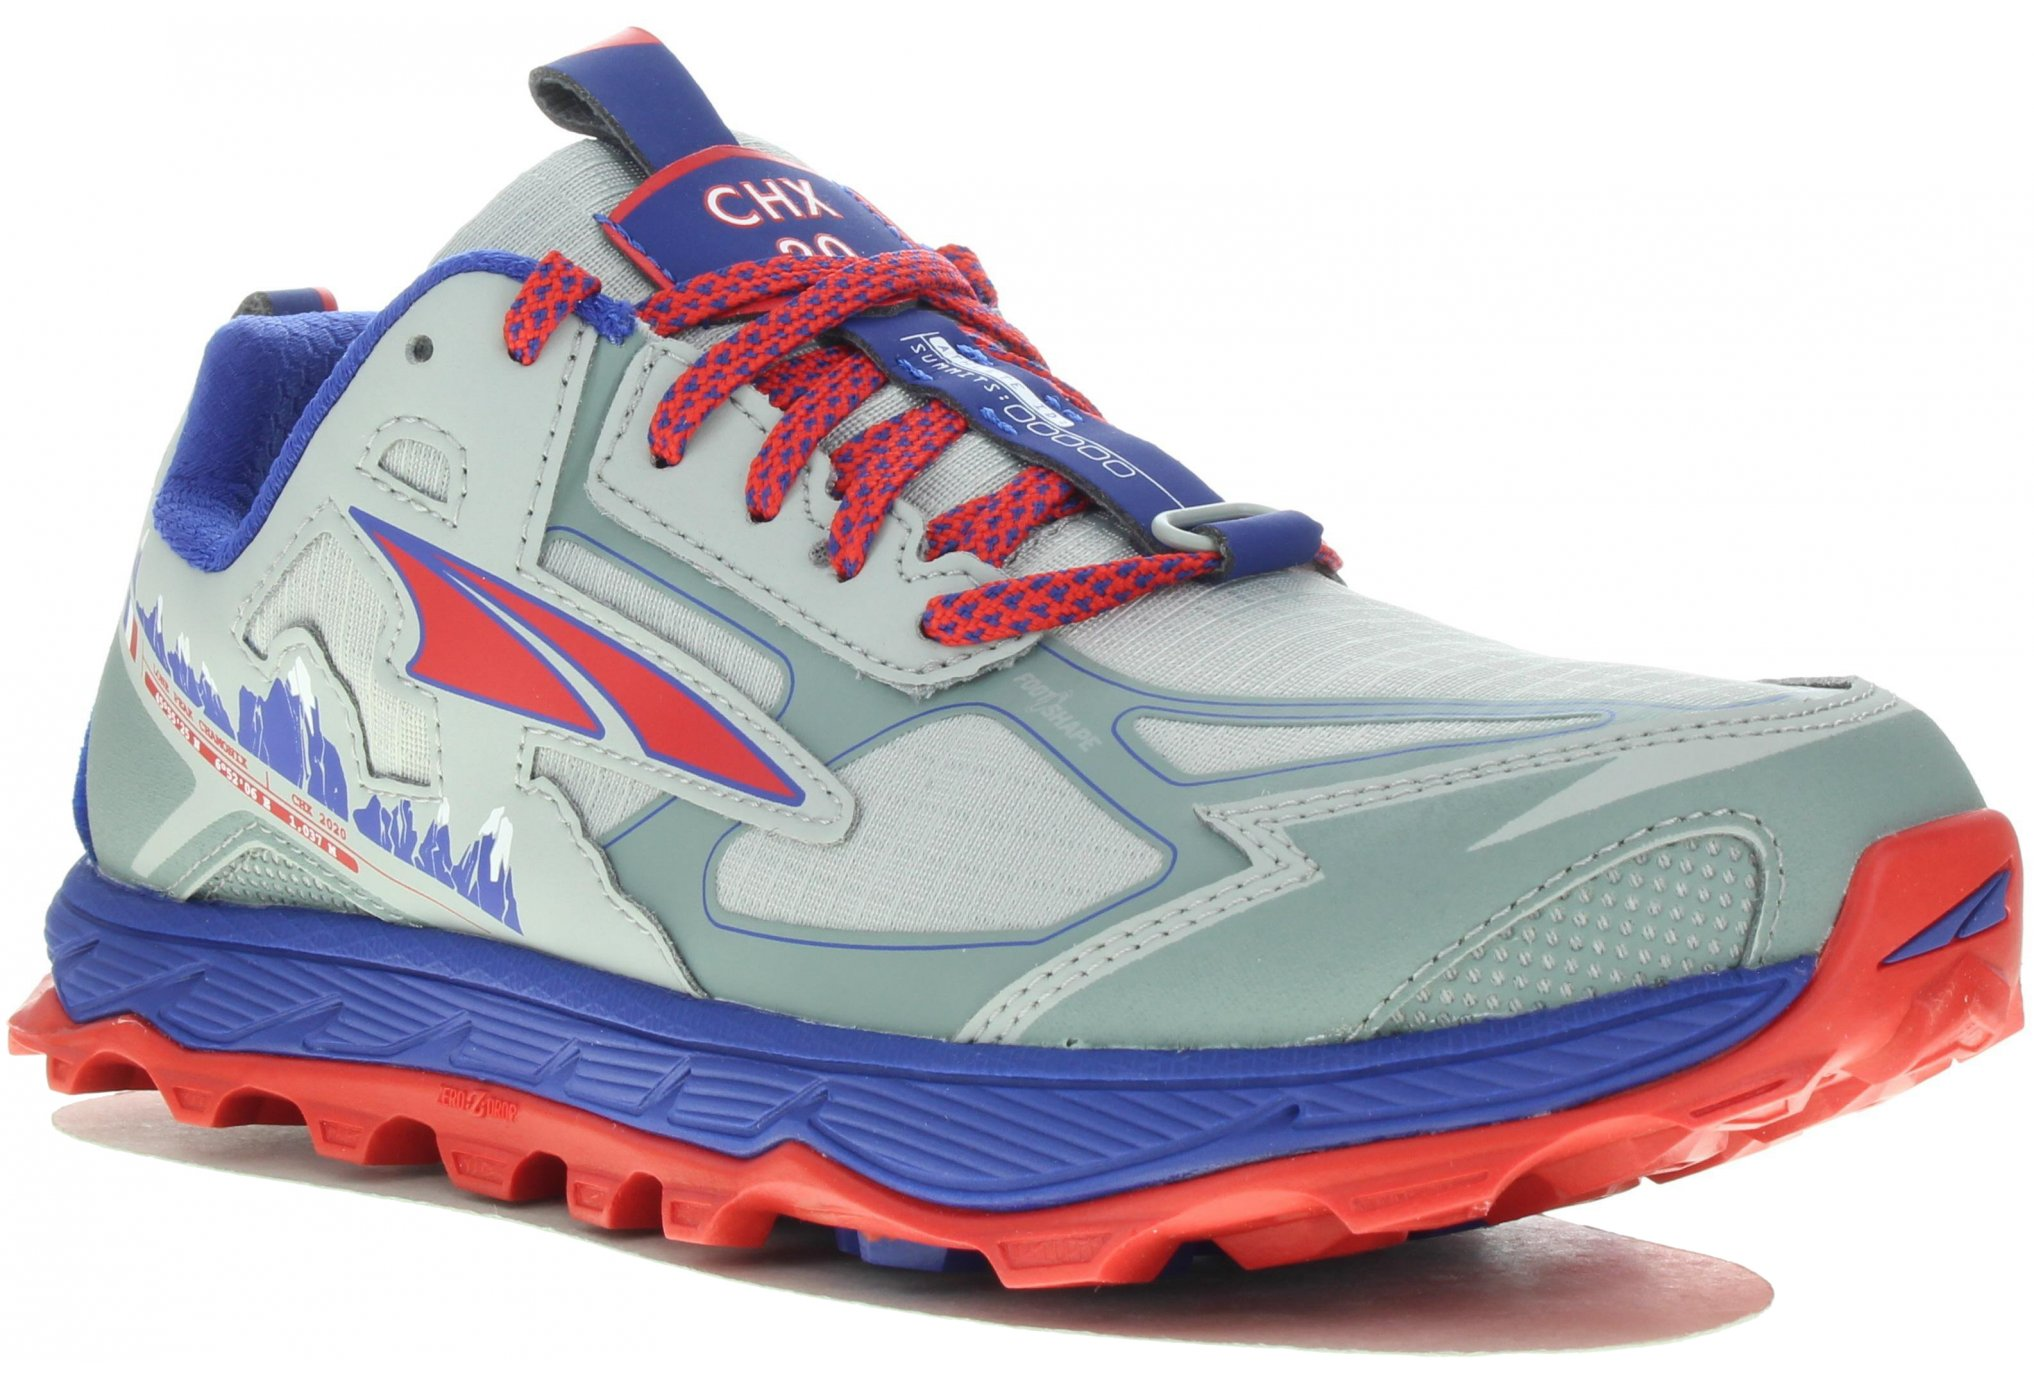 Altra Lone Peak 4.5 Chamonix W Chaussures running femme